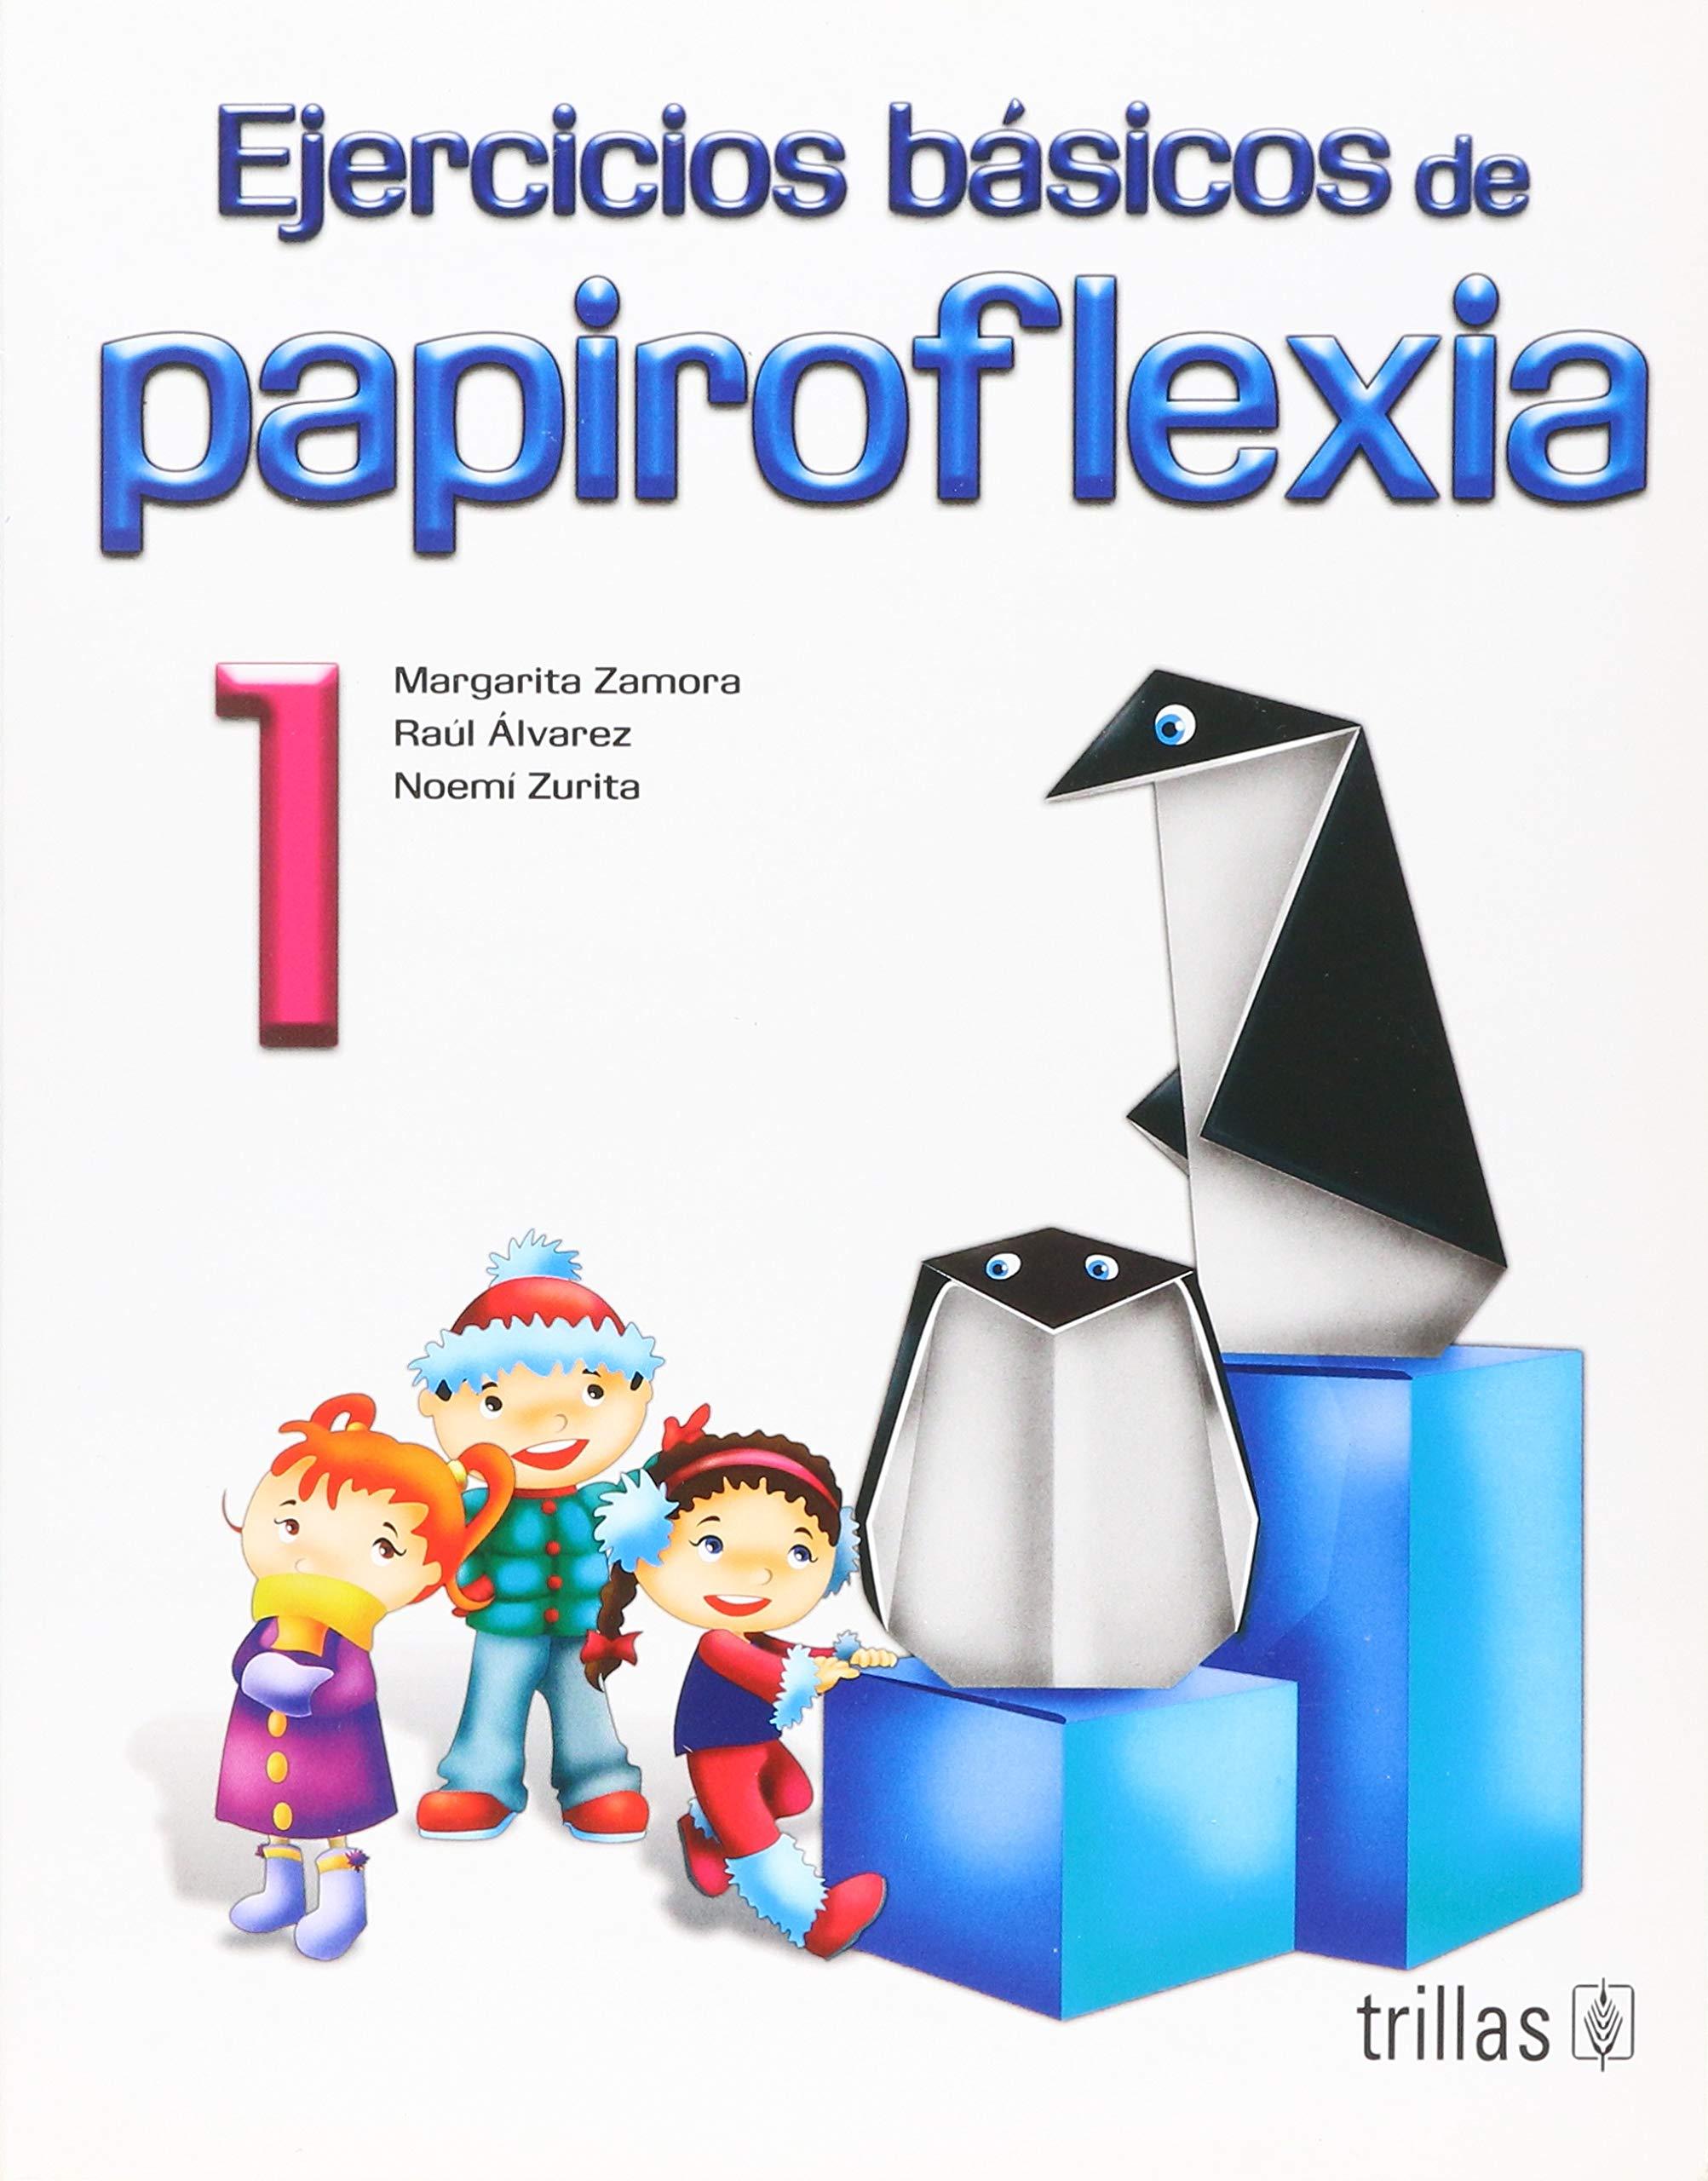 Download Ejercicios basicos de Papiroflexia/ Basic Origami Excersises (Spanish Edition) pdf